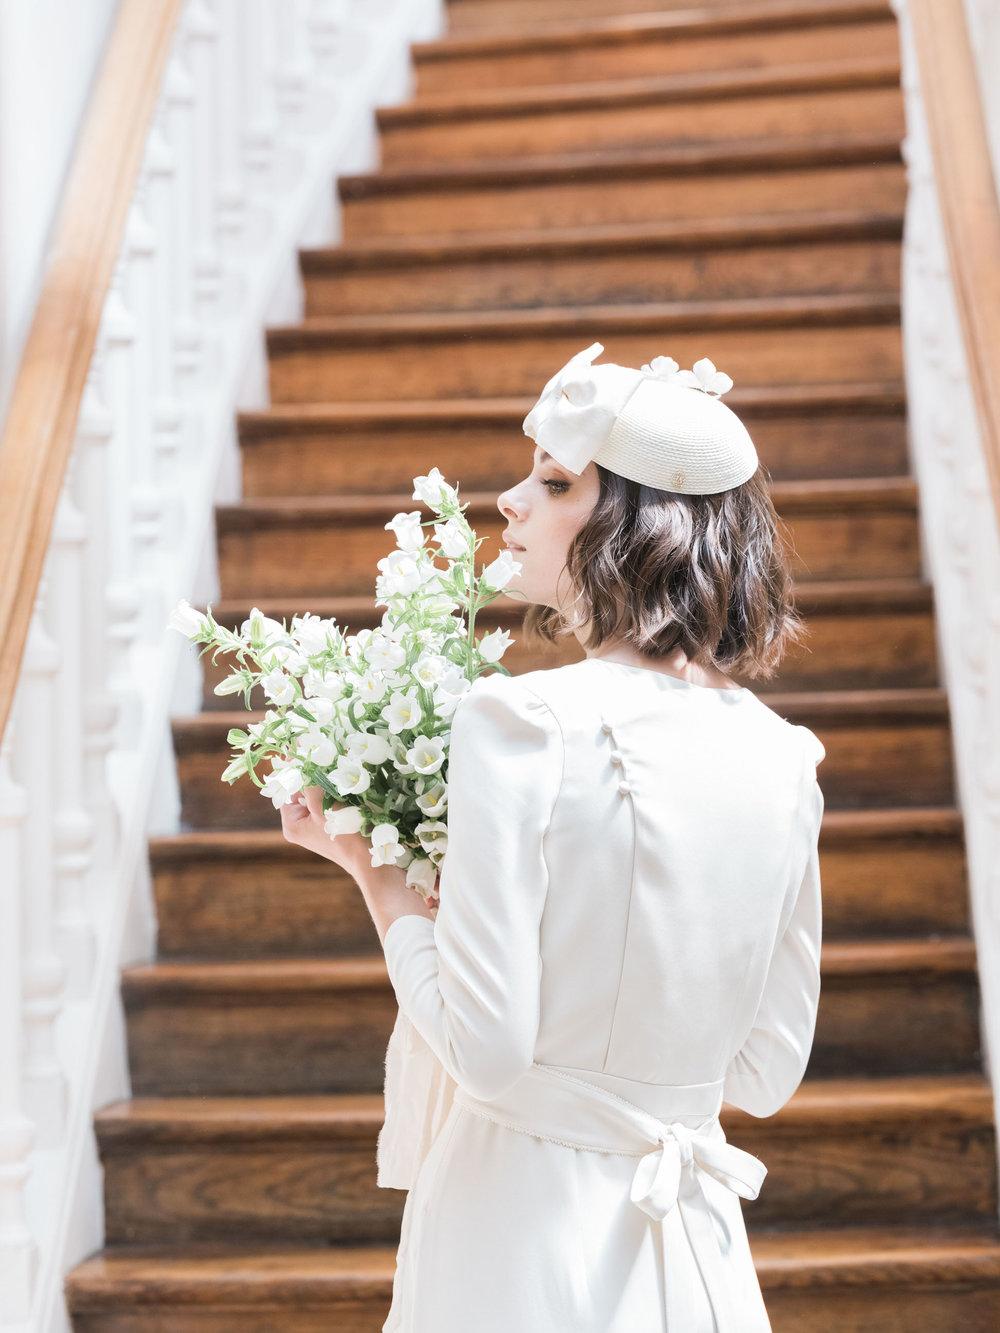 beautiful+vintage+bridal+couture+by+laure+de+sagazan+in+paris+france.jpegbeautiful vintage bridal couture by laure de sagazan in paris france